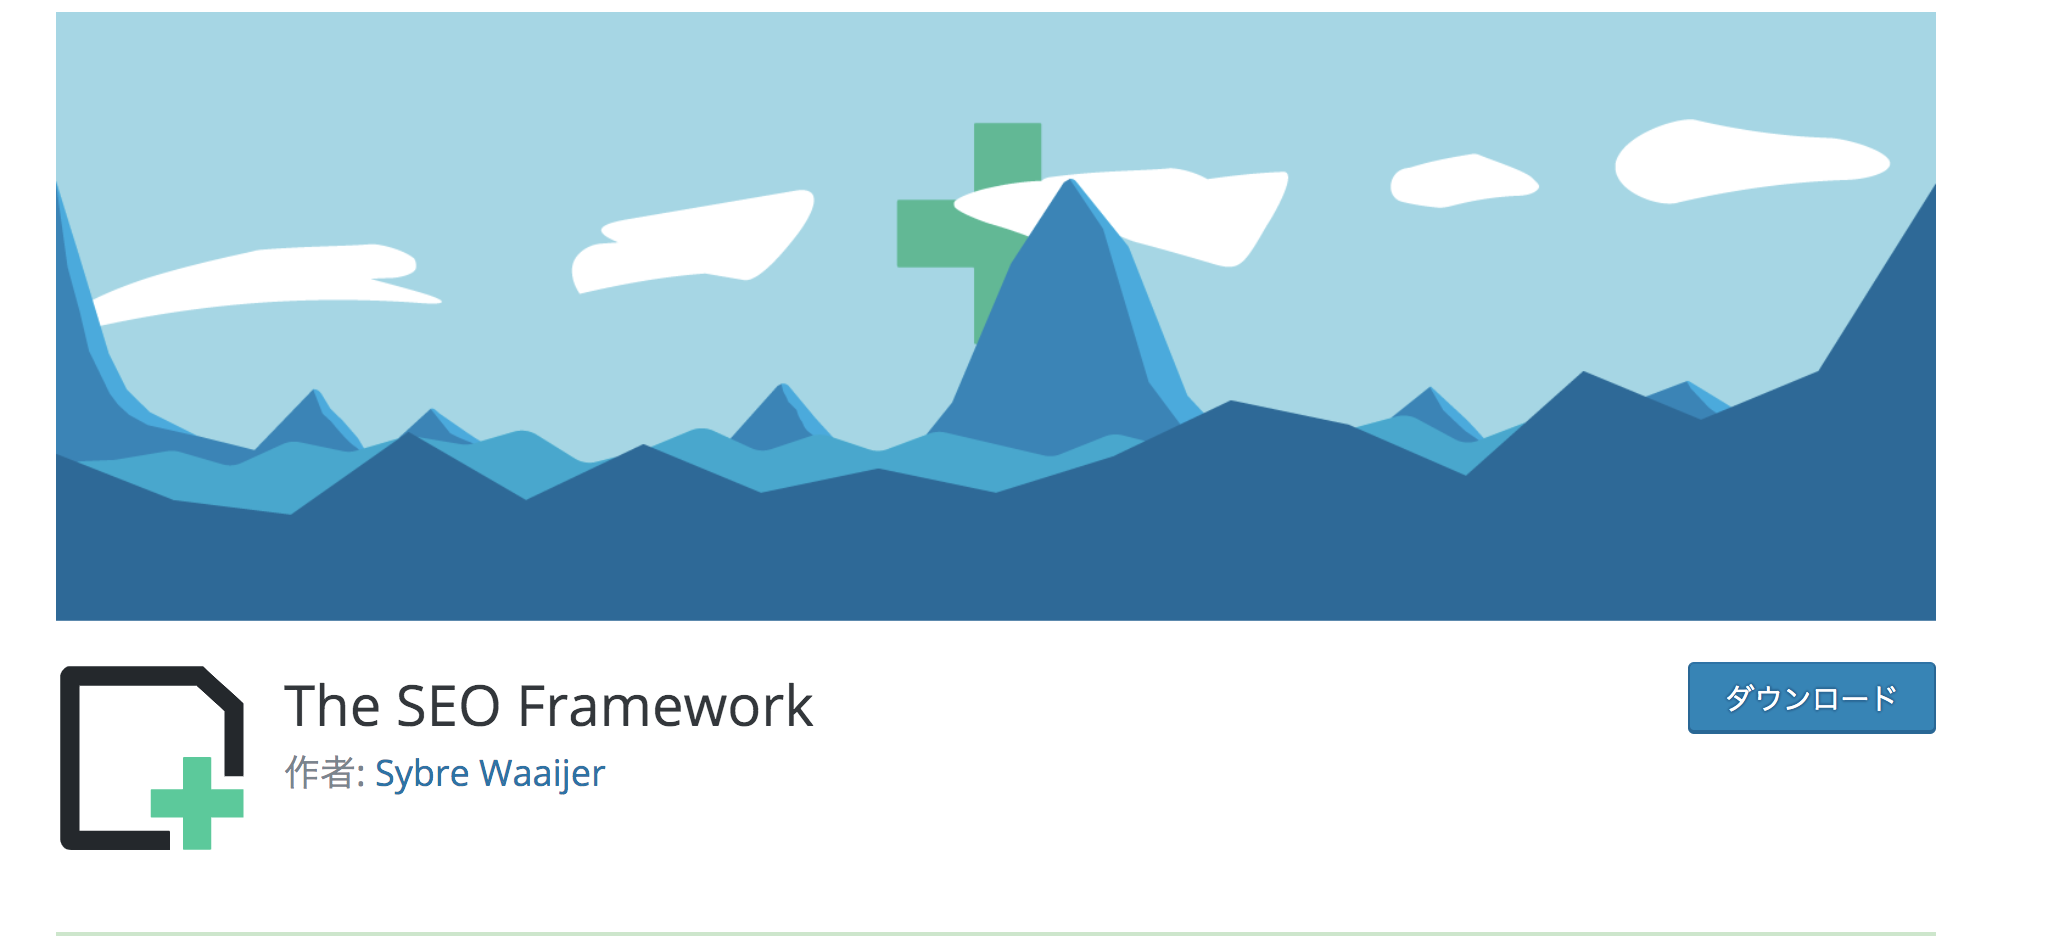 WordPress(ワードプレス) プラグイン The SEO Framework